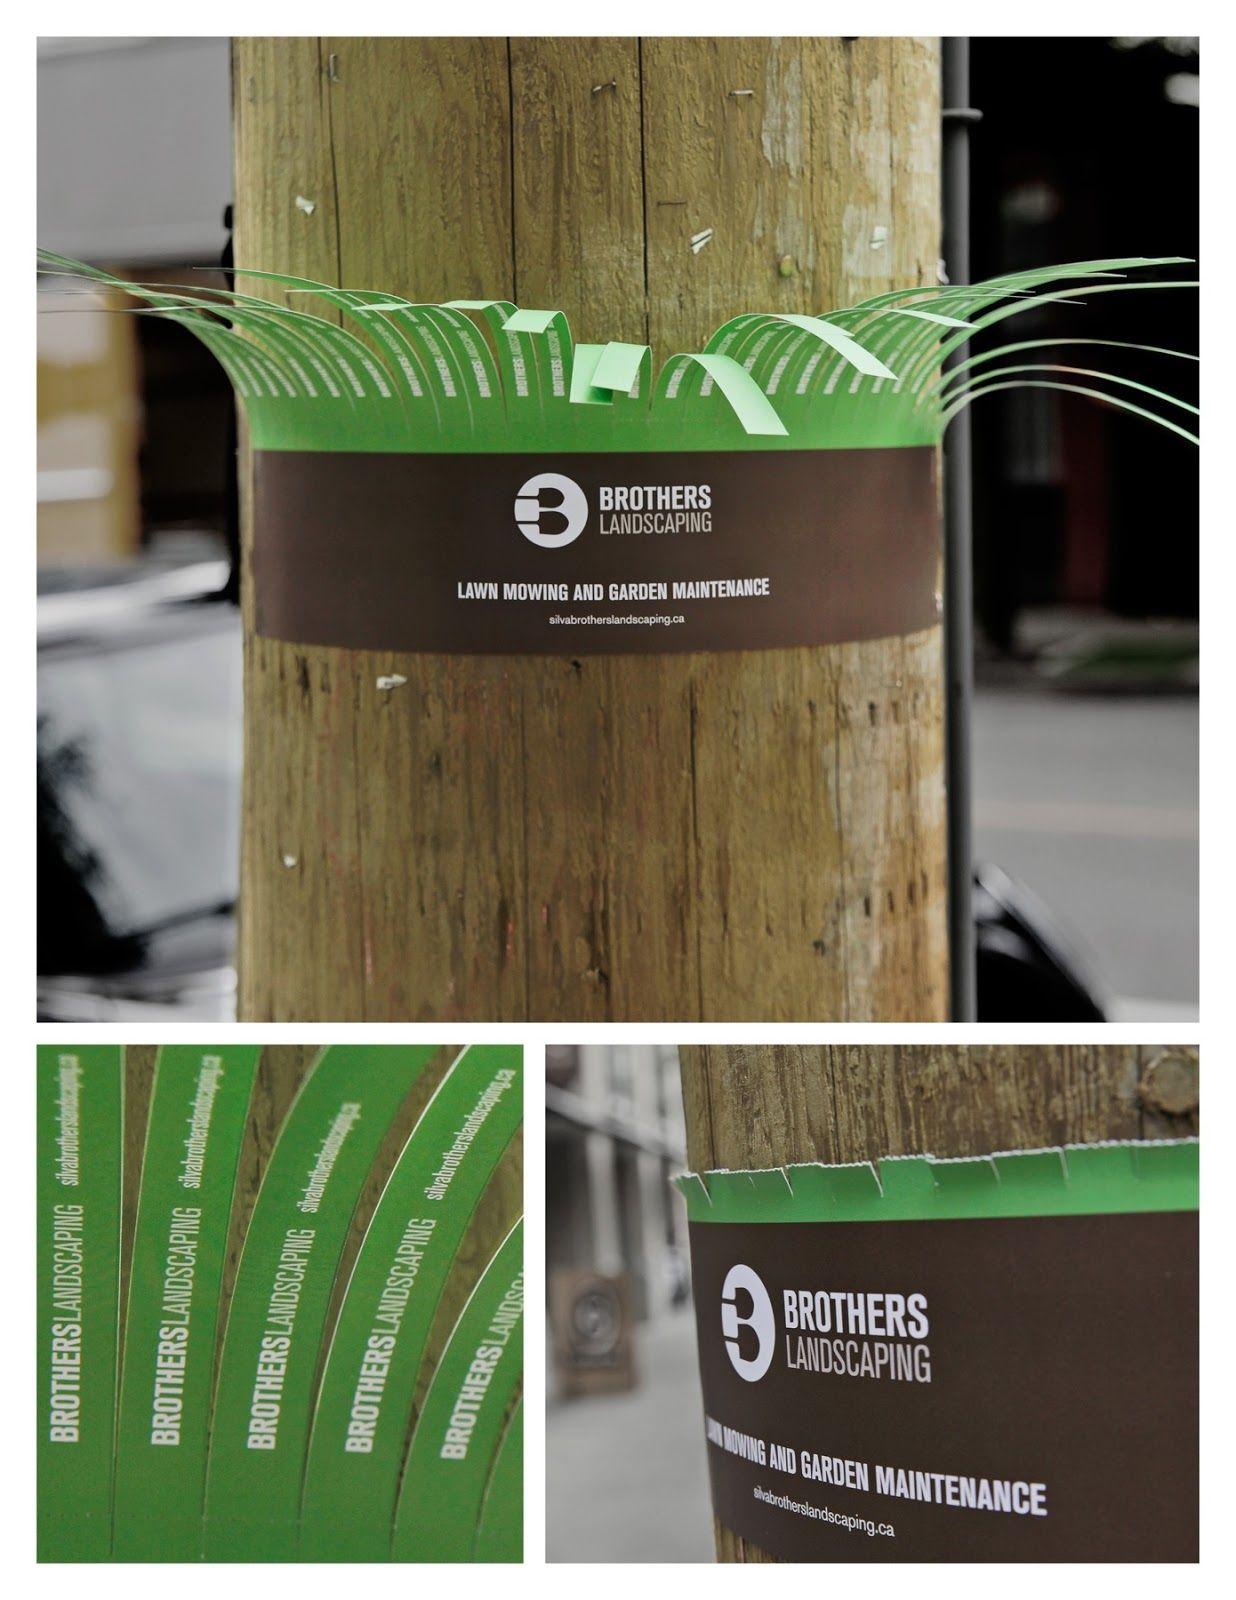 guerilla marketing door sticker - Google Search   Tactical Urbanism ...